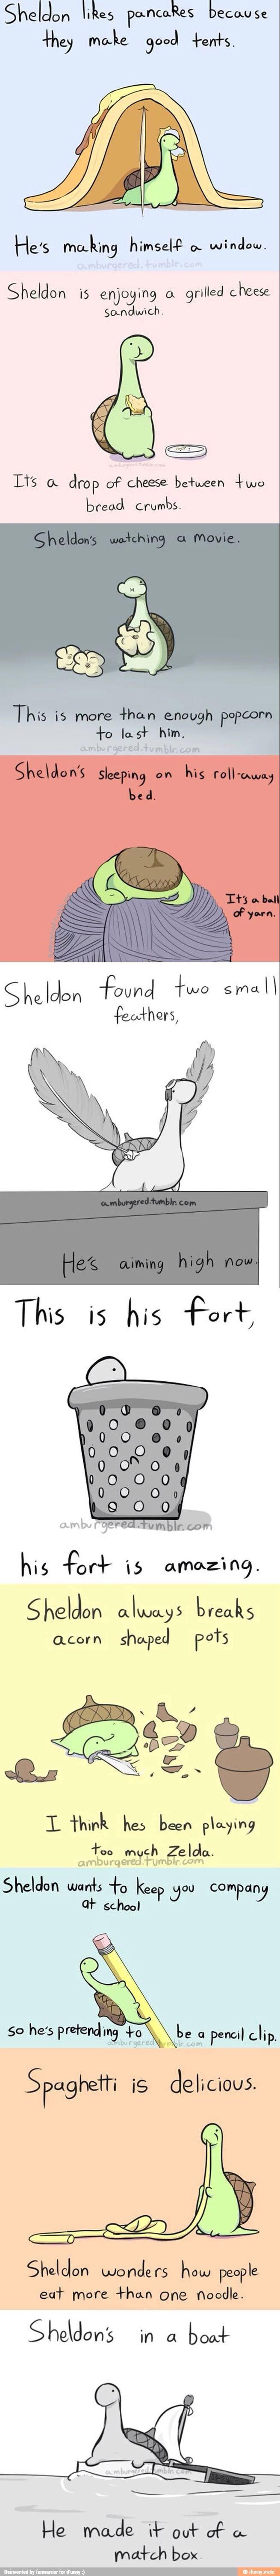 Literally dying if cuteness. #dinosaurpics